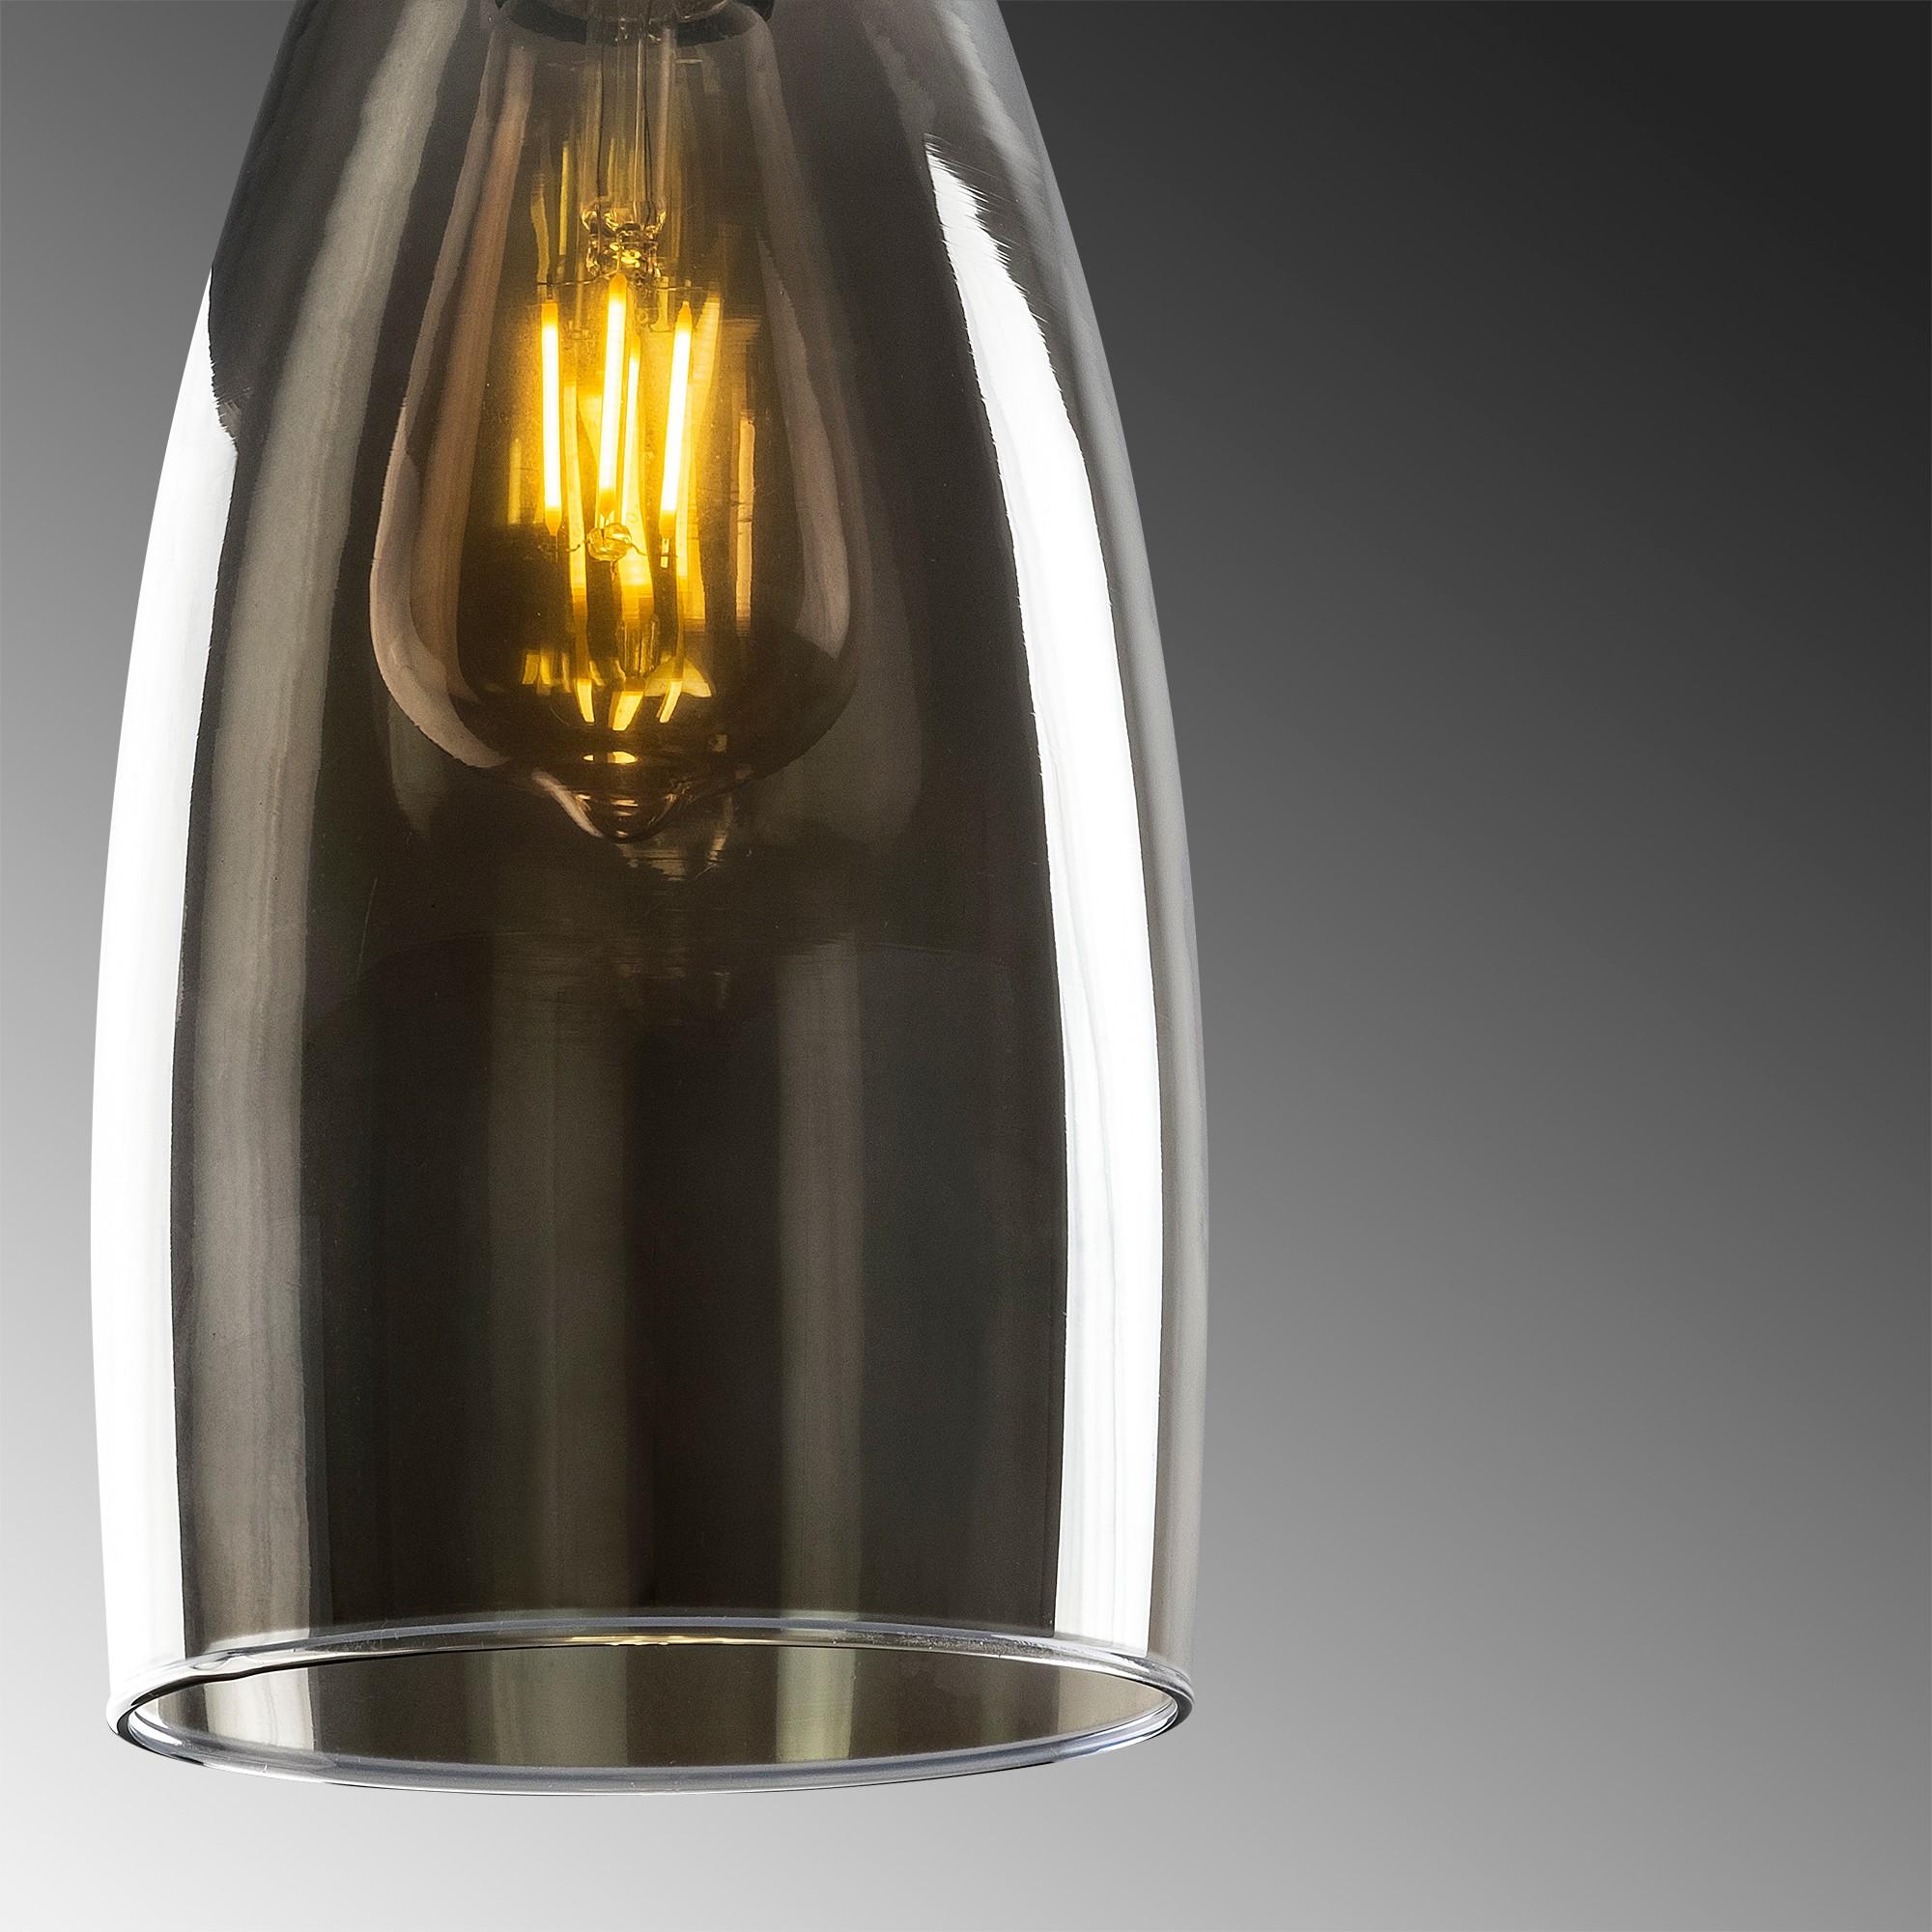 Hanglamp glad smoked glass langwerpig 1 x E27 fitting - closeup